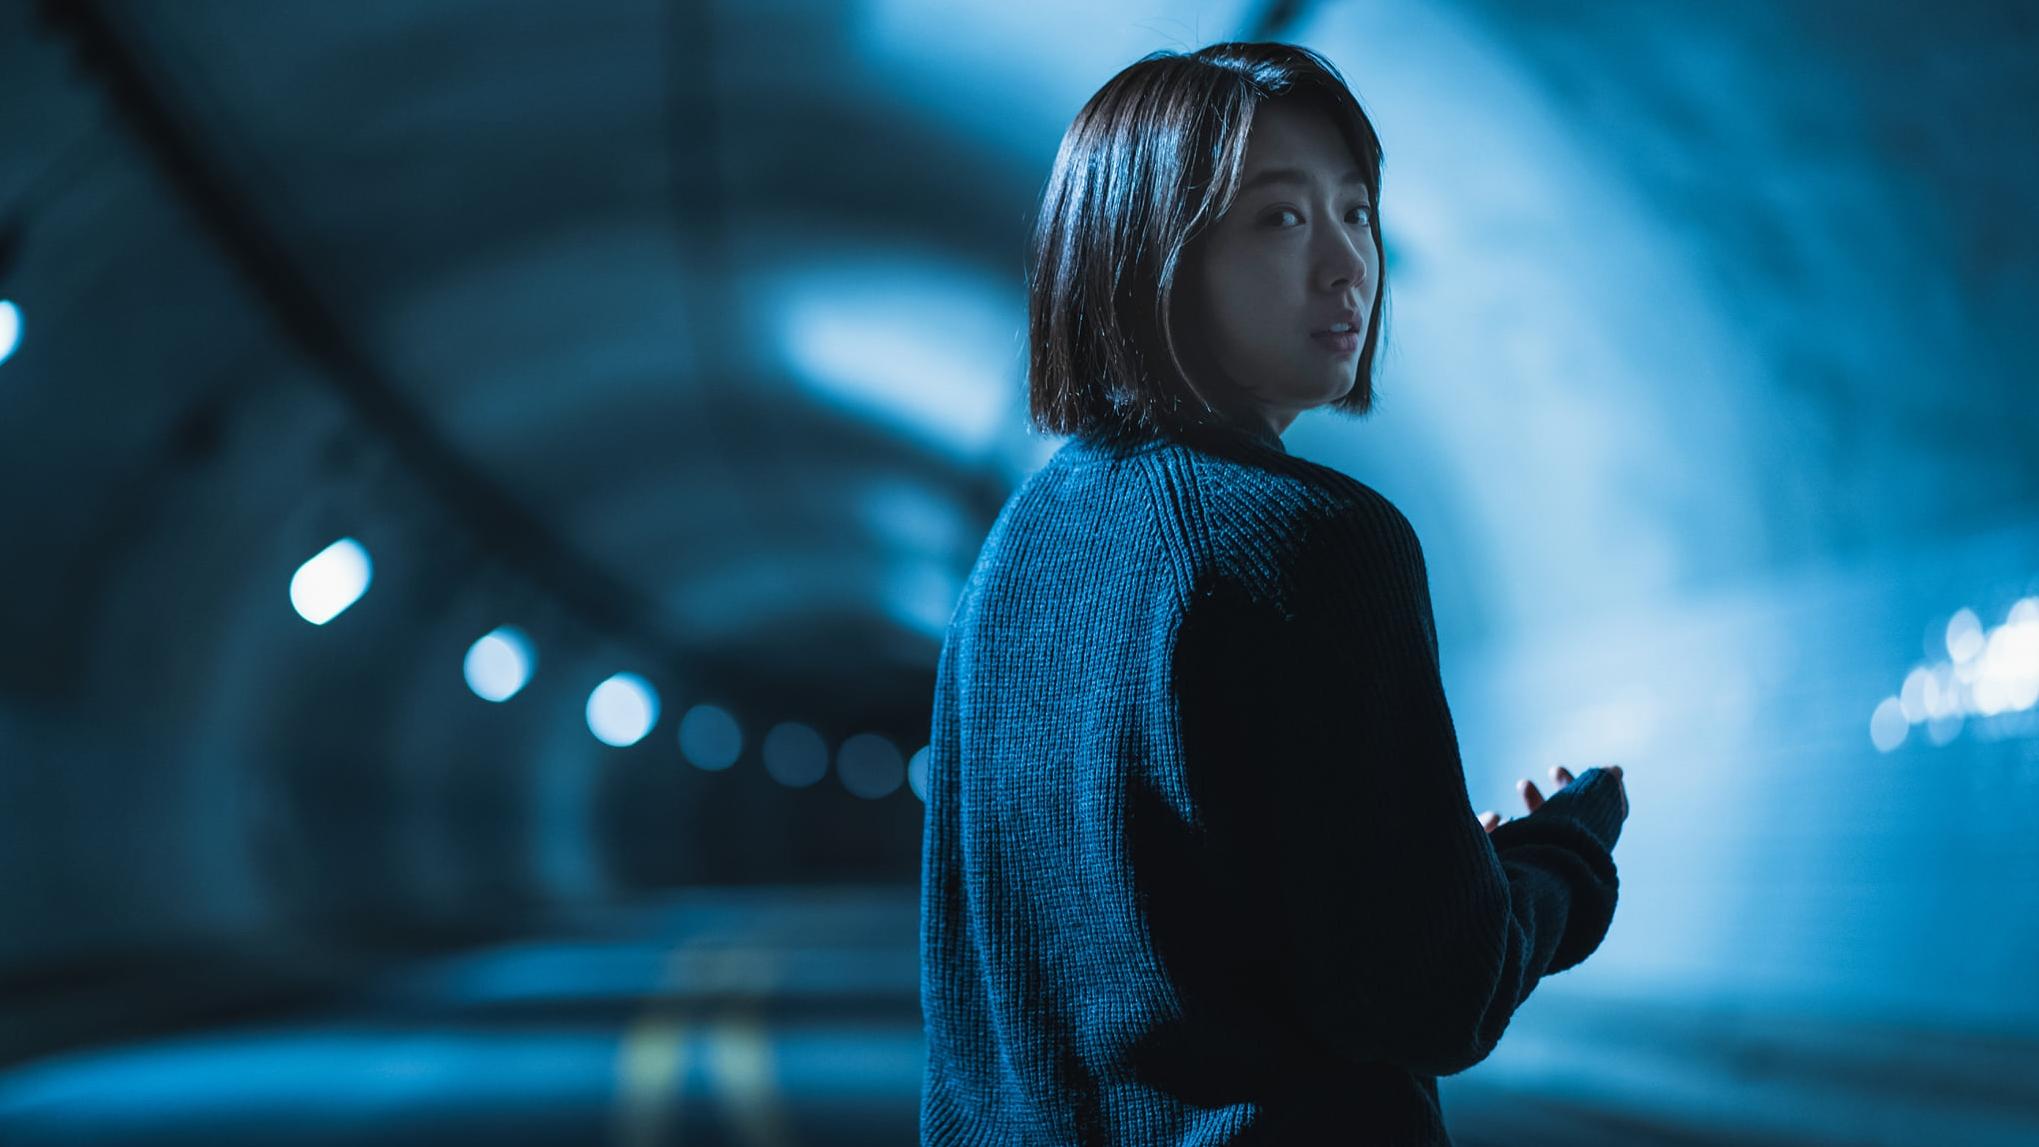 Park Shin Hye's New Thriller Film 'Call' Premieres on Netflix This November